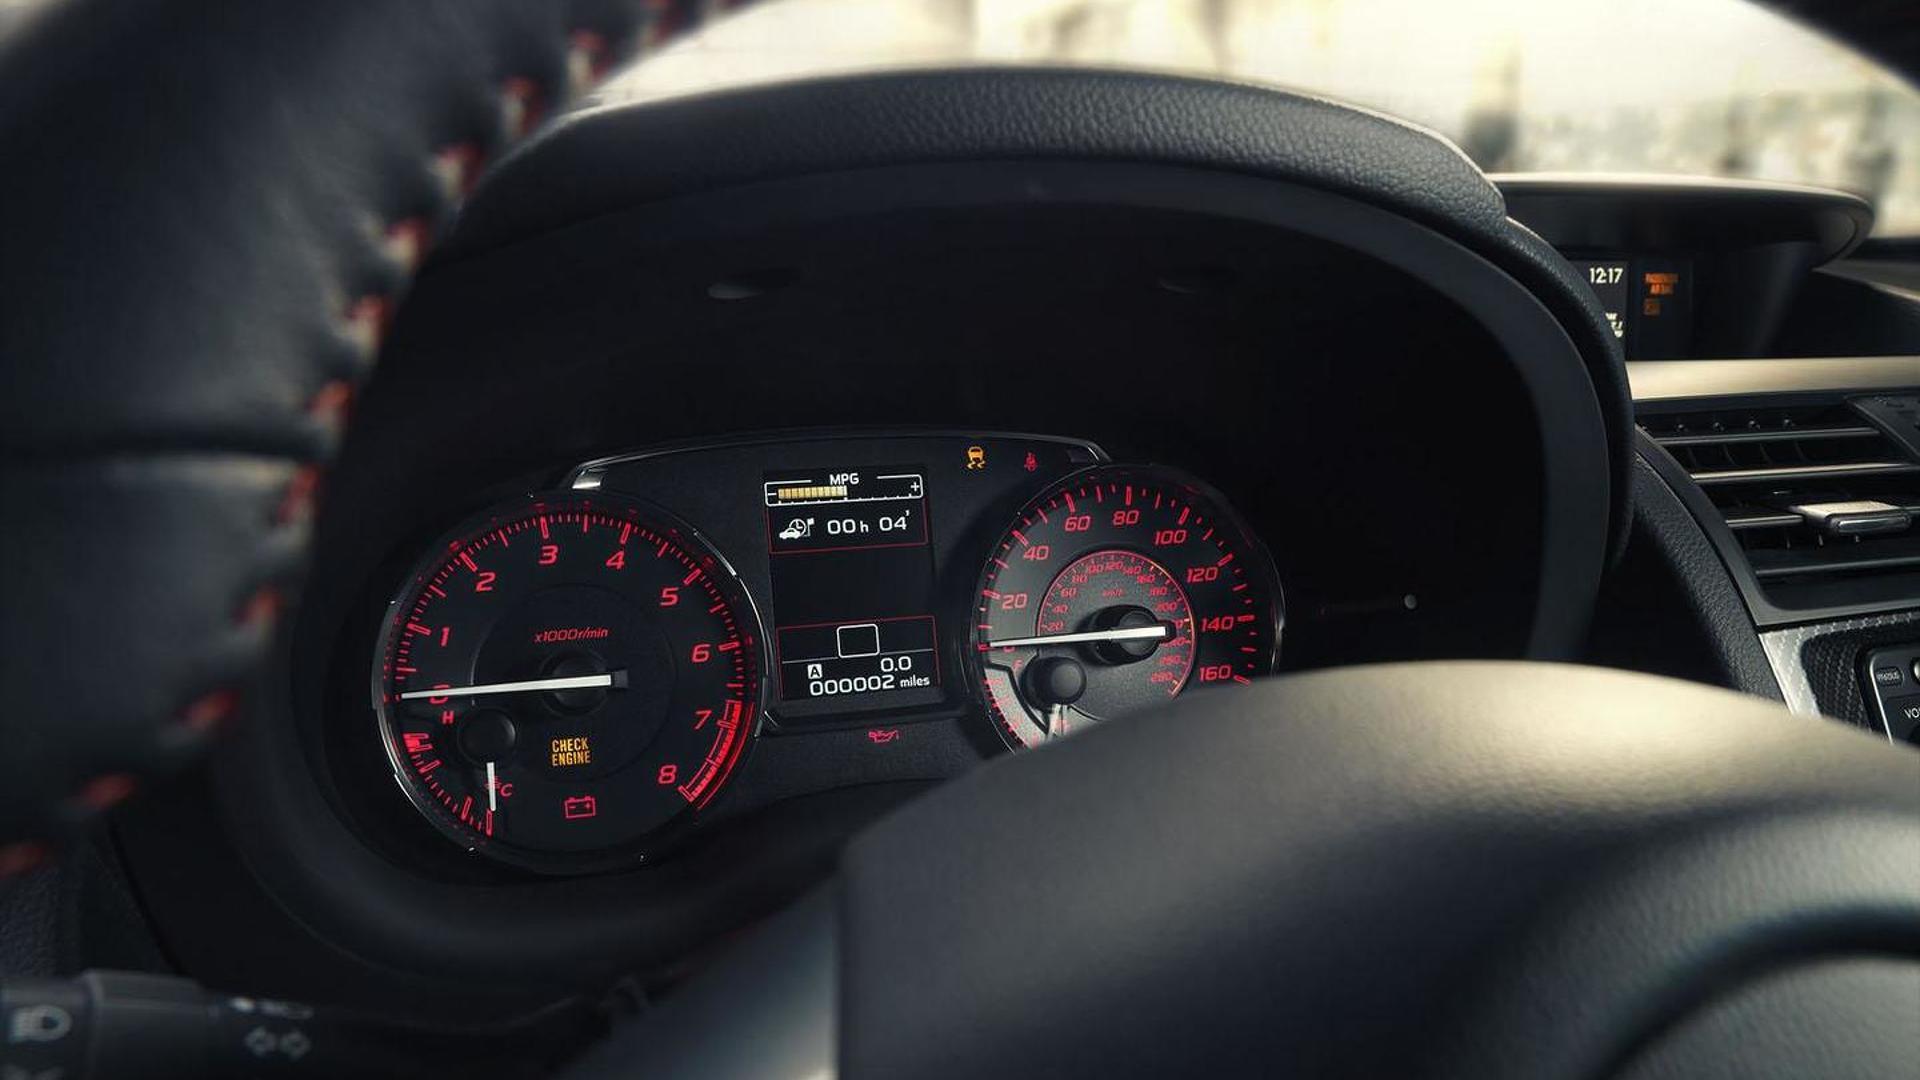 Subaru Wrx 0 60 >> 2015 Subaru Wrx Gets Detailed Can Accelerate From 0 60 Mph